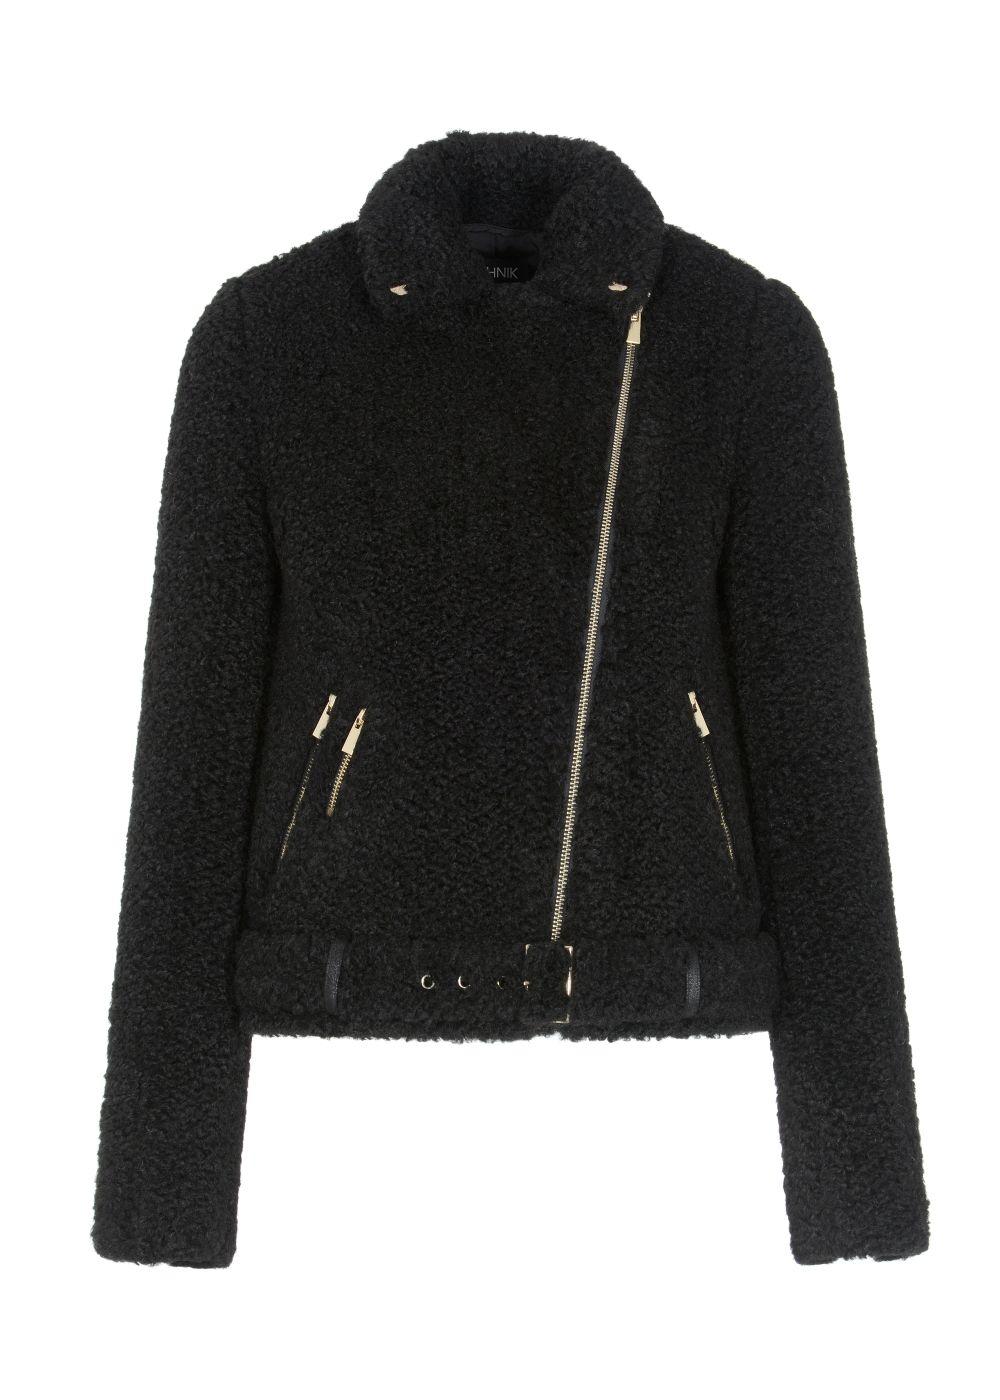 Czarne futerko damskie o kroju ramoneski FUTDT-0038-99(Z20)